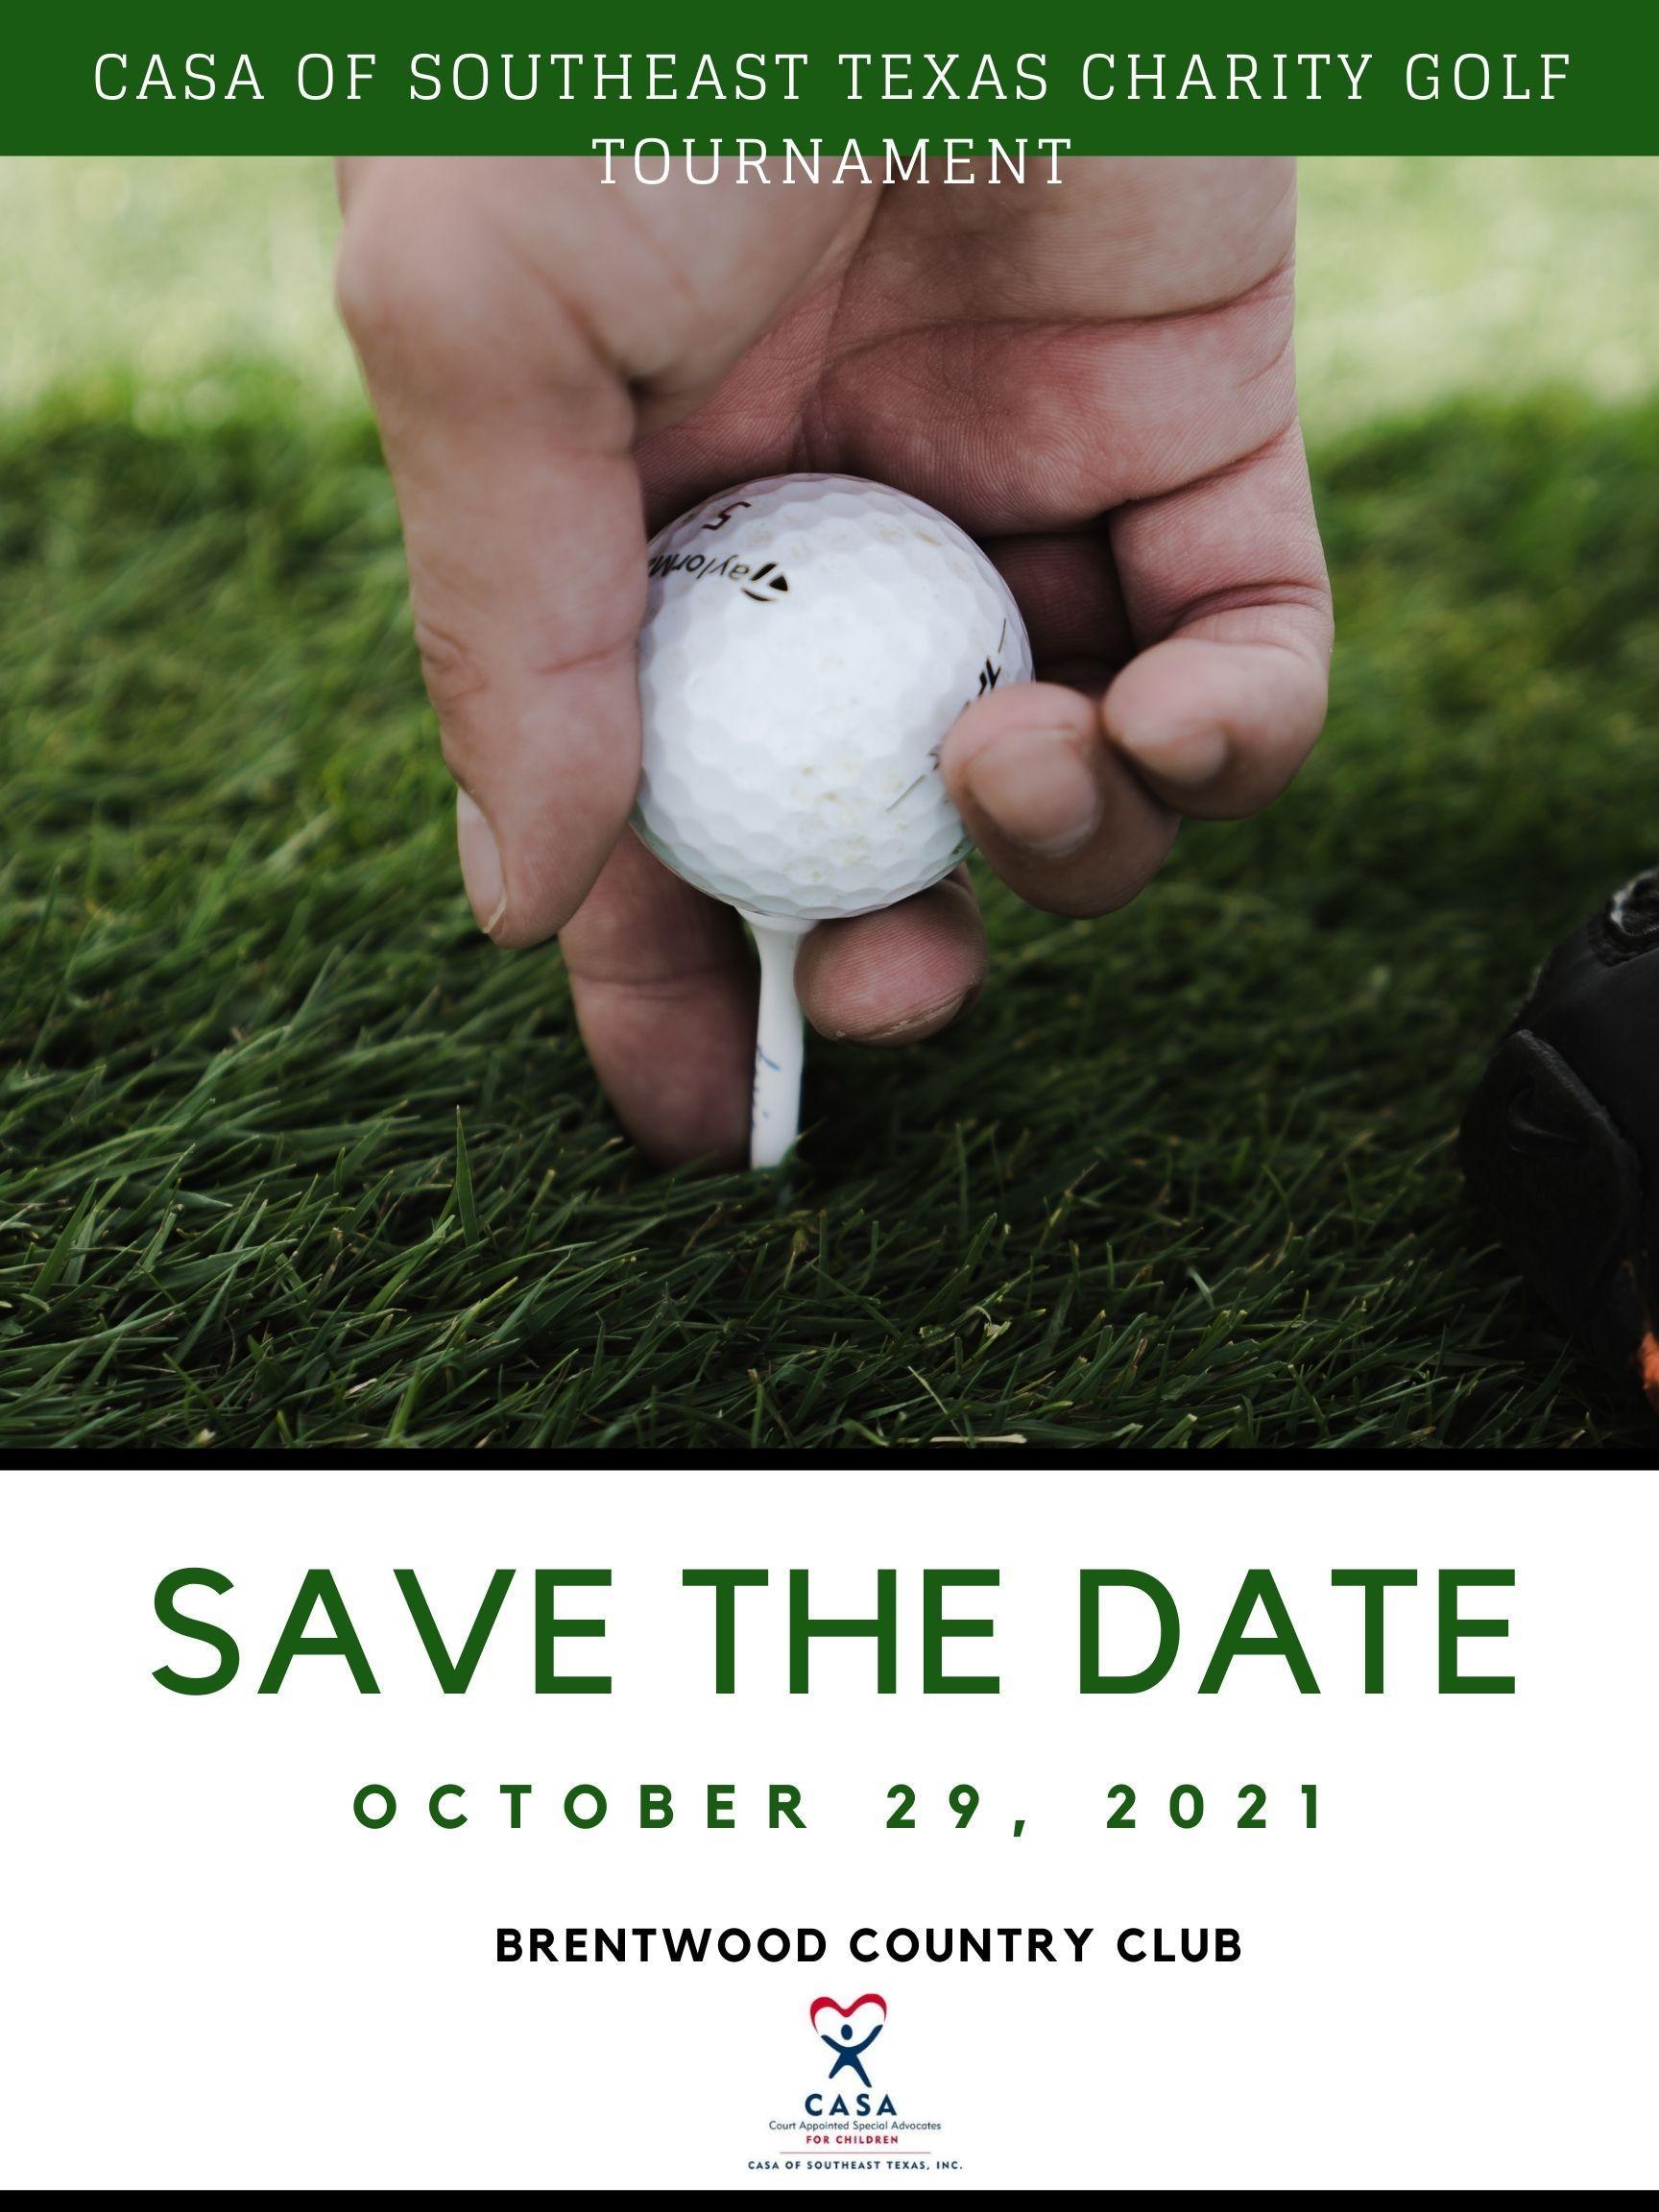 CASA Charity Golf Tournament